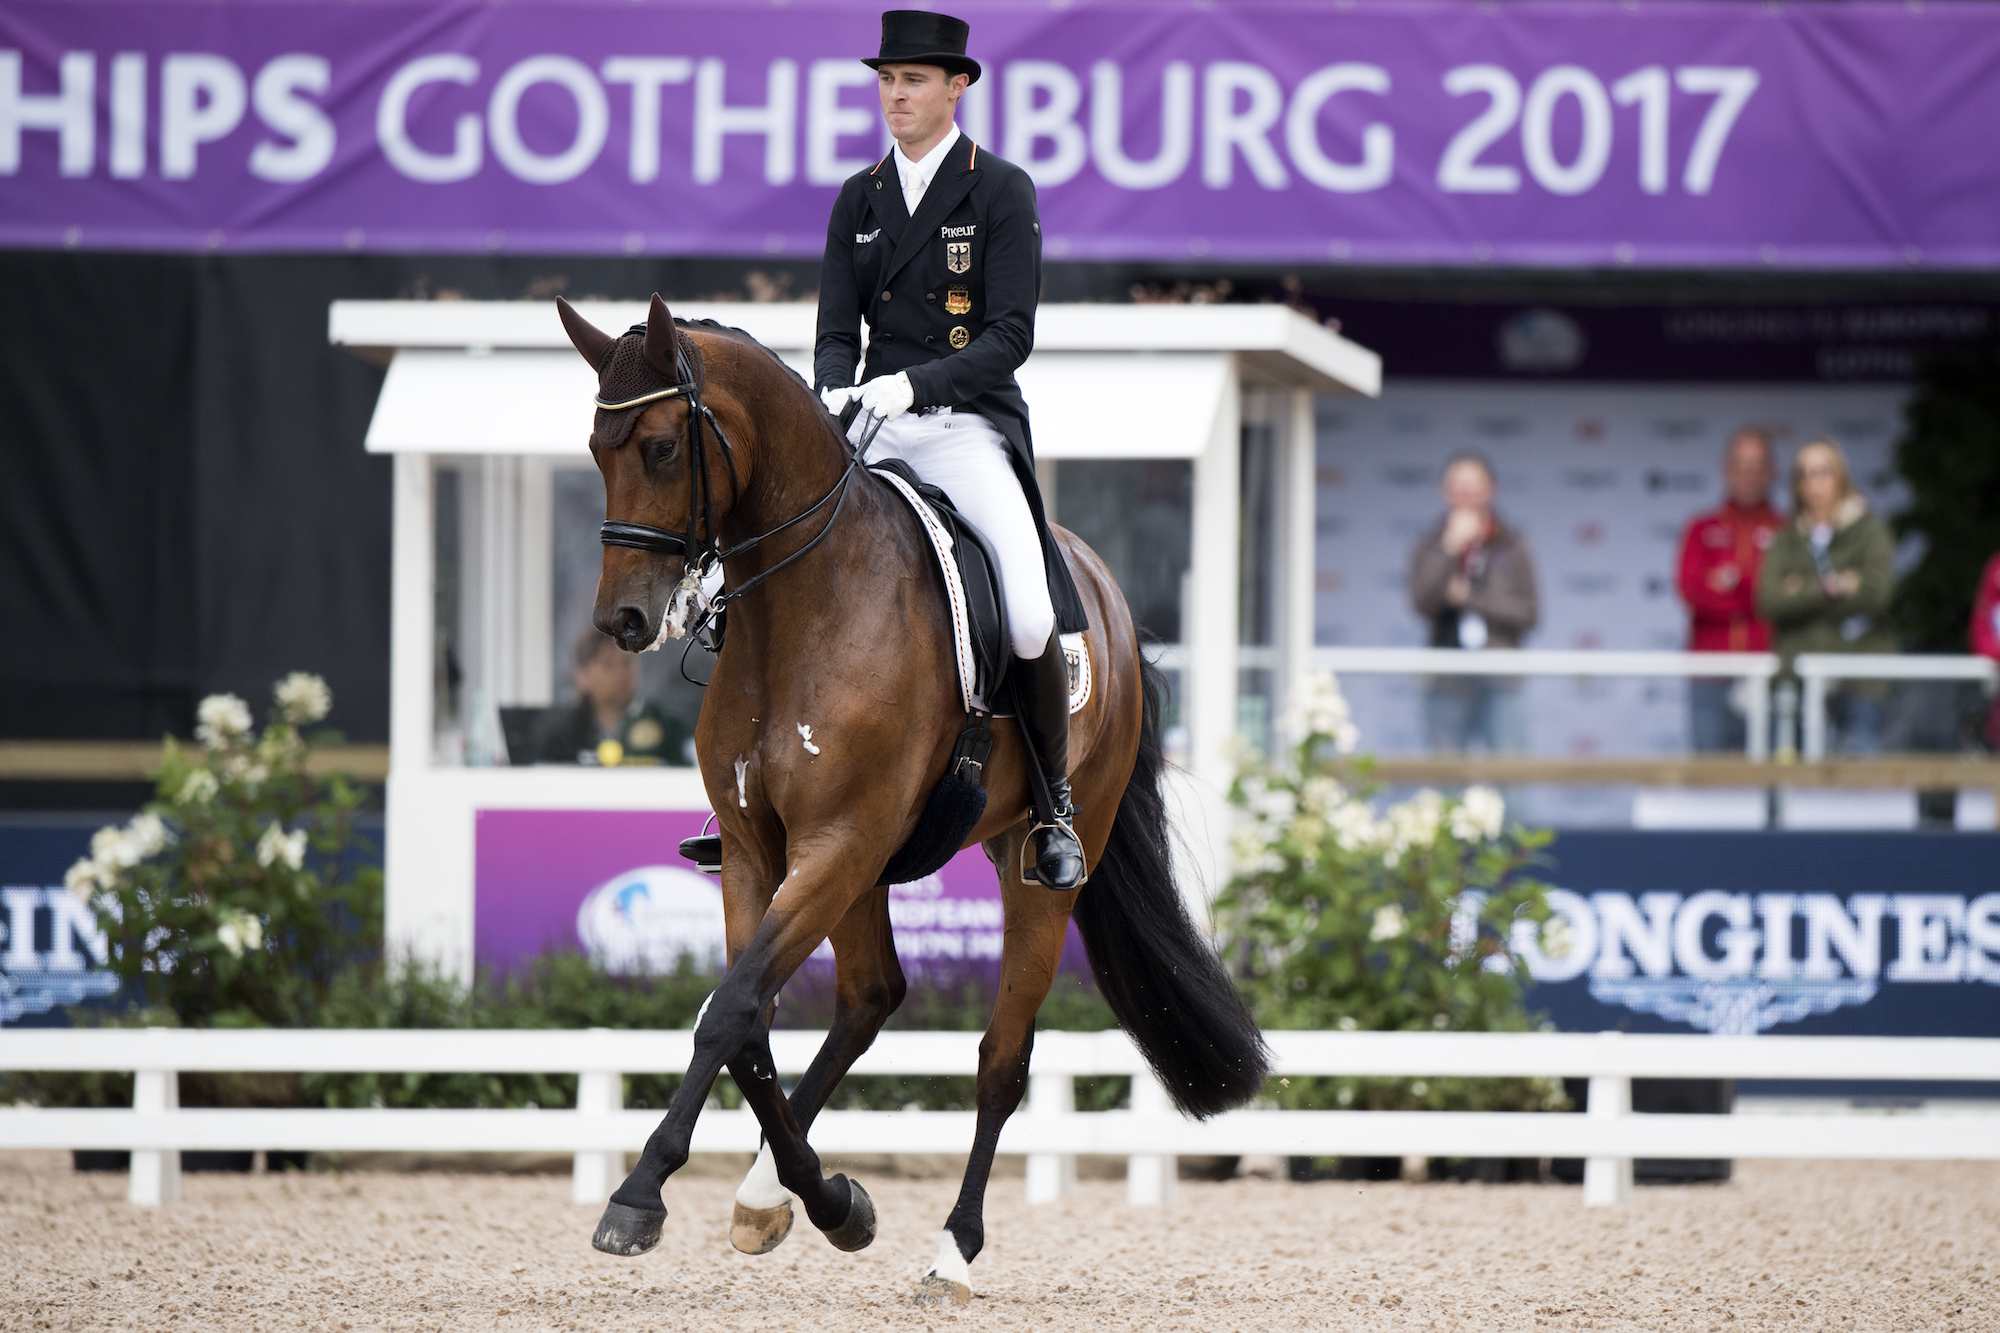 Sönke Rothenberger: Looking Forwards